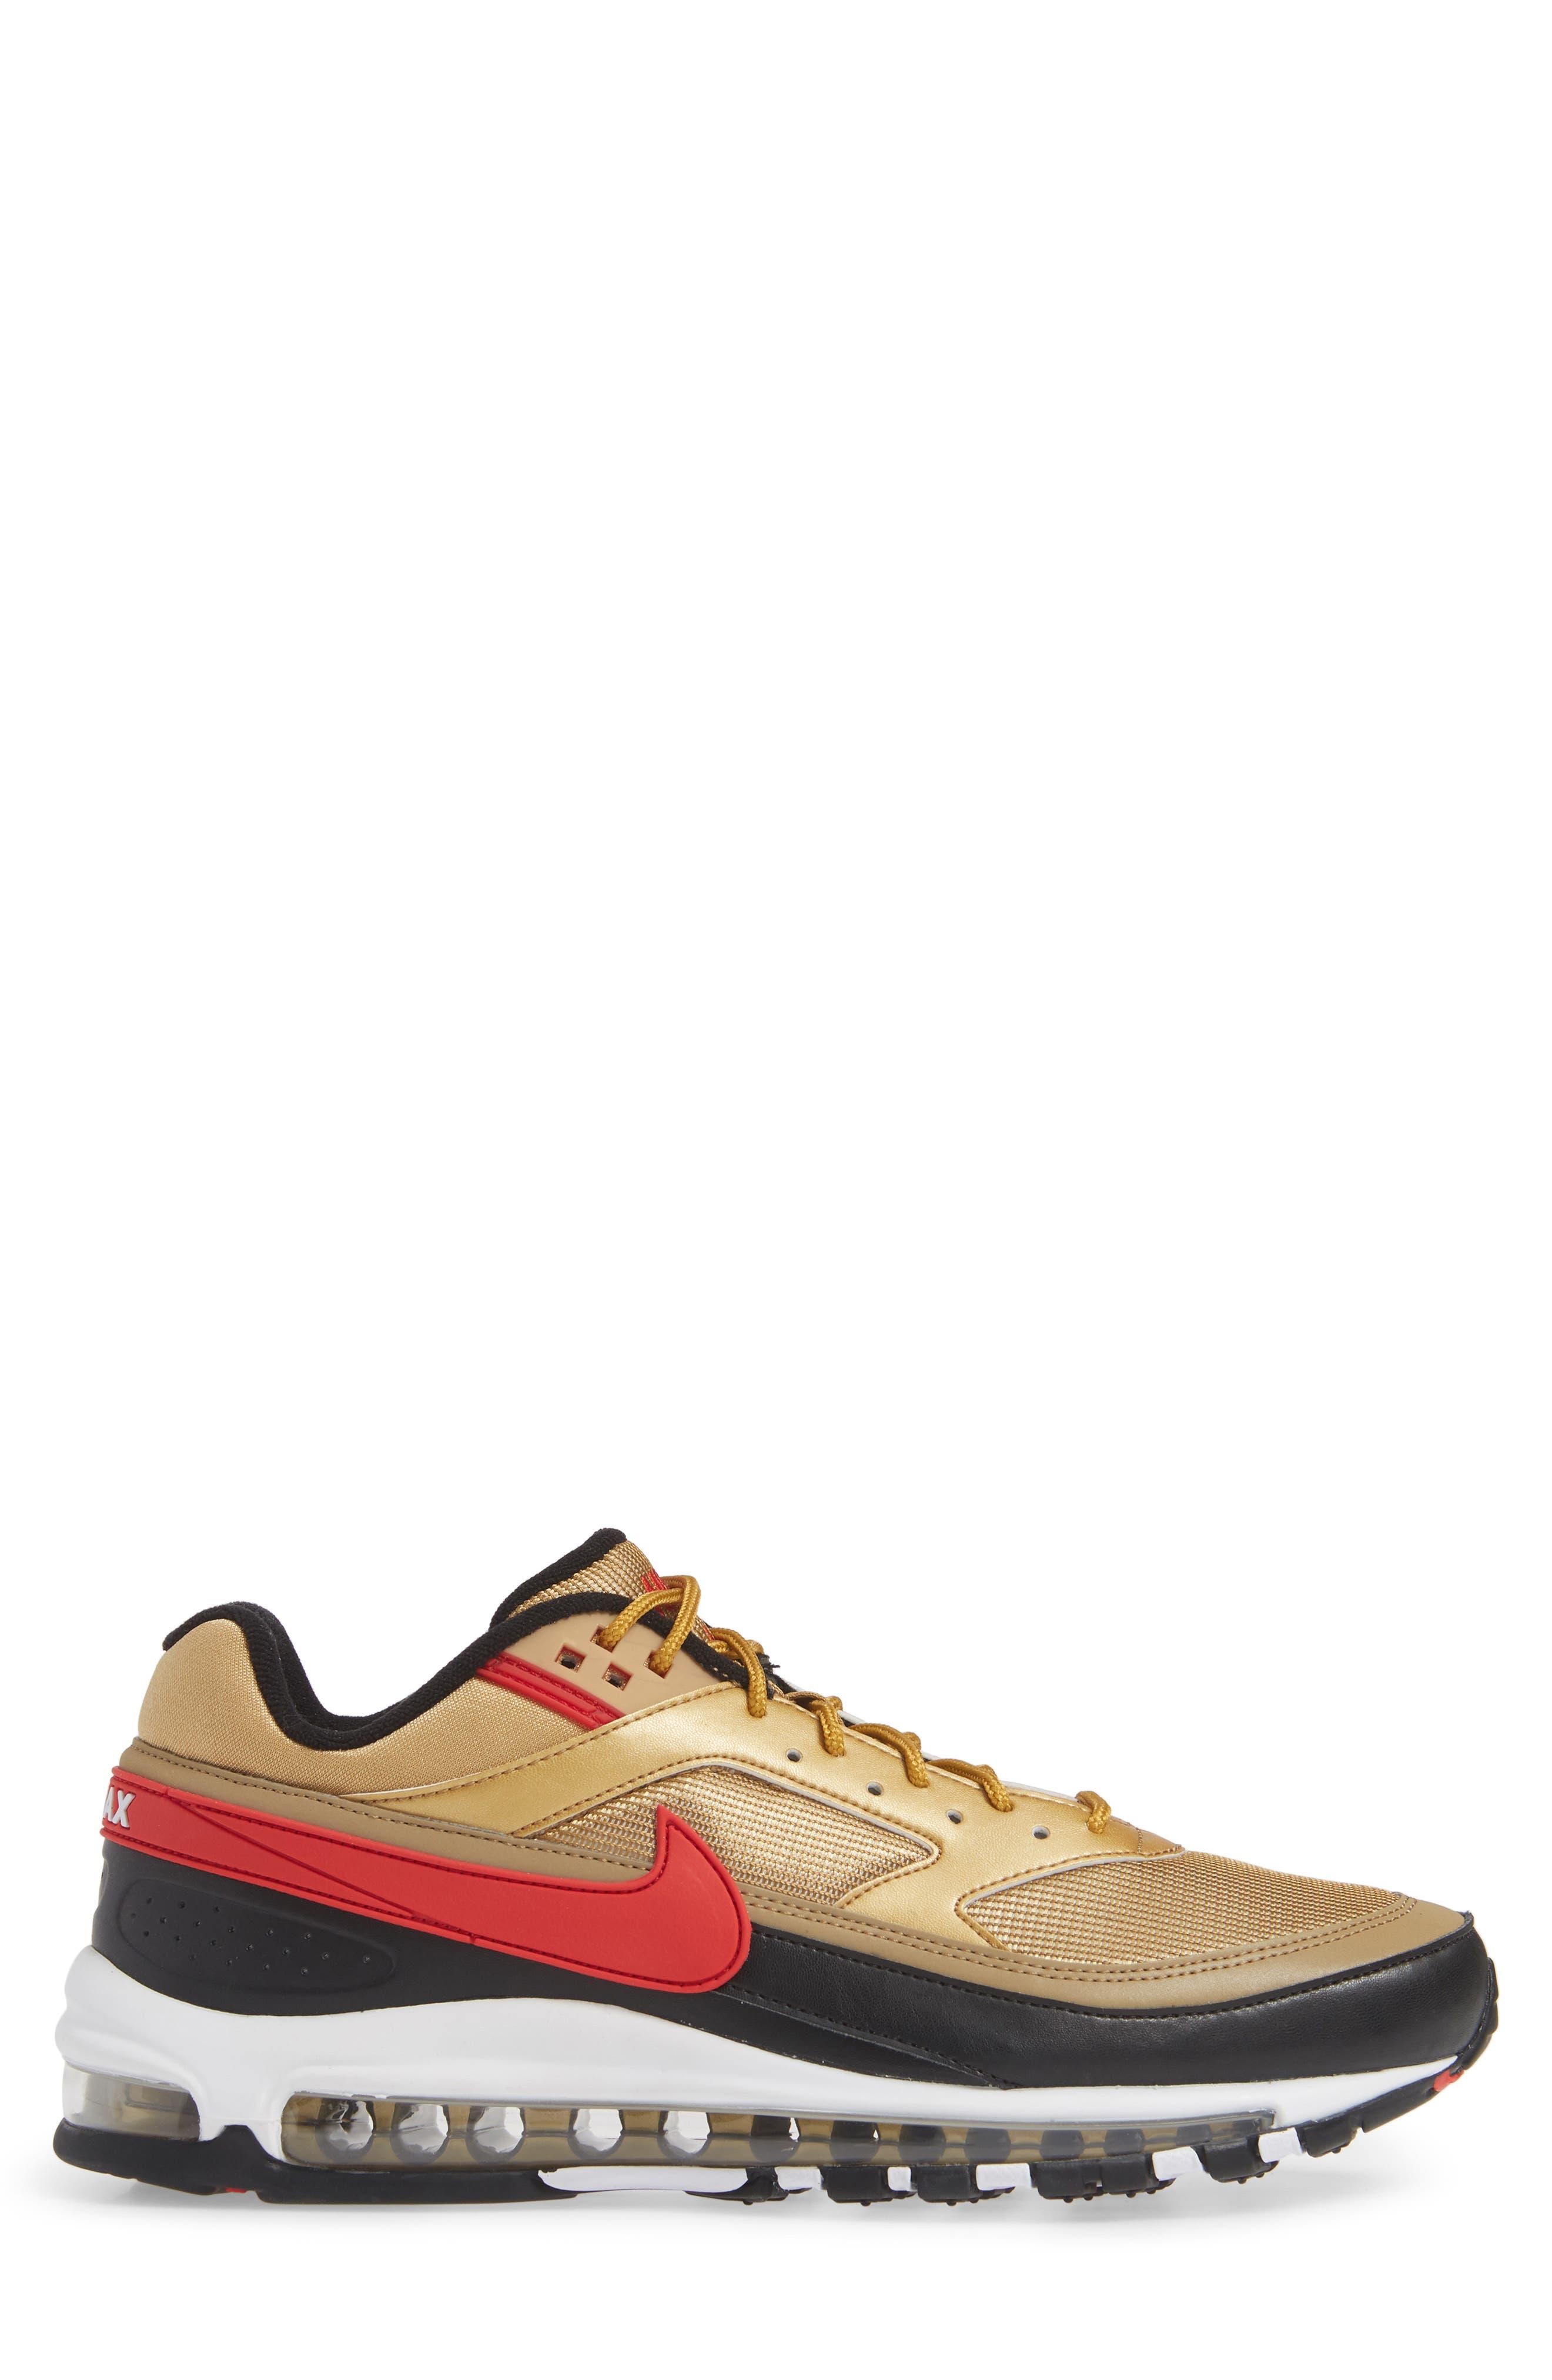 NIKE, Air Max 97 BW Sneaker, Alternate thumbnail 3, color, 040